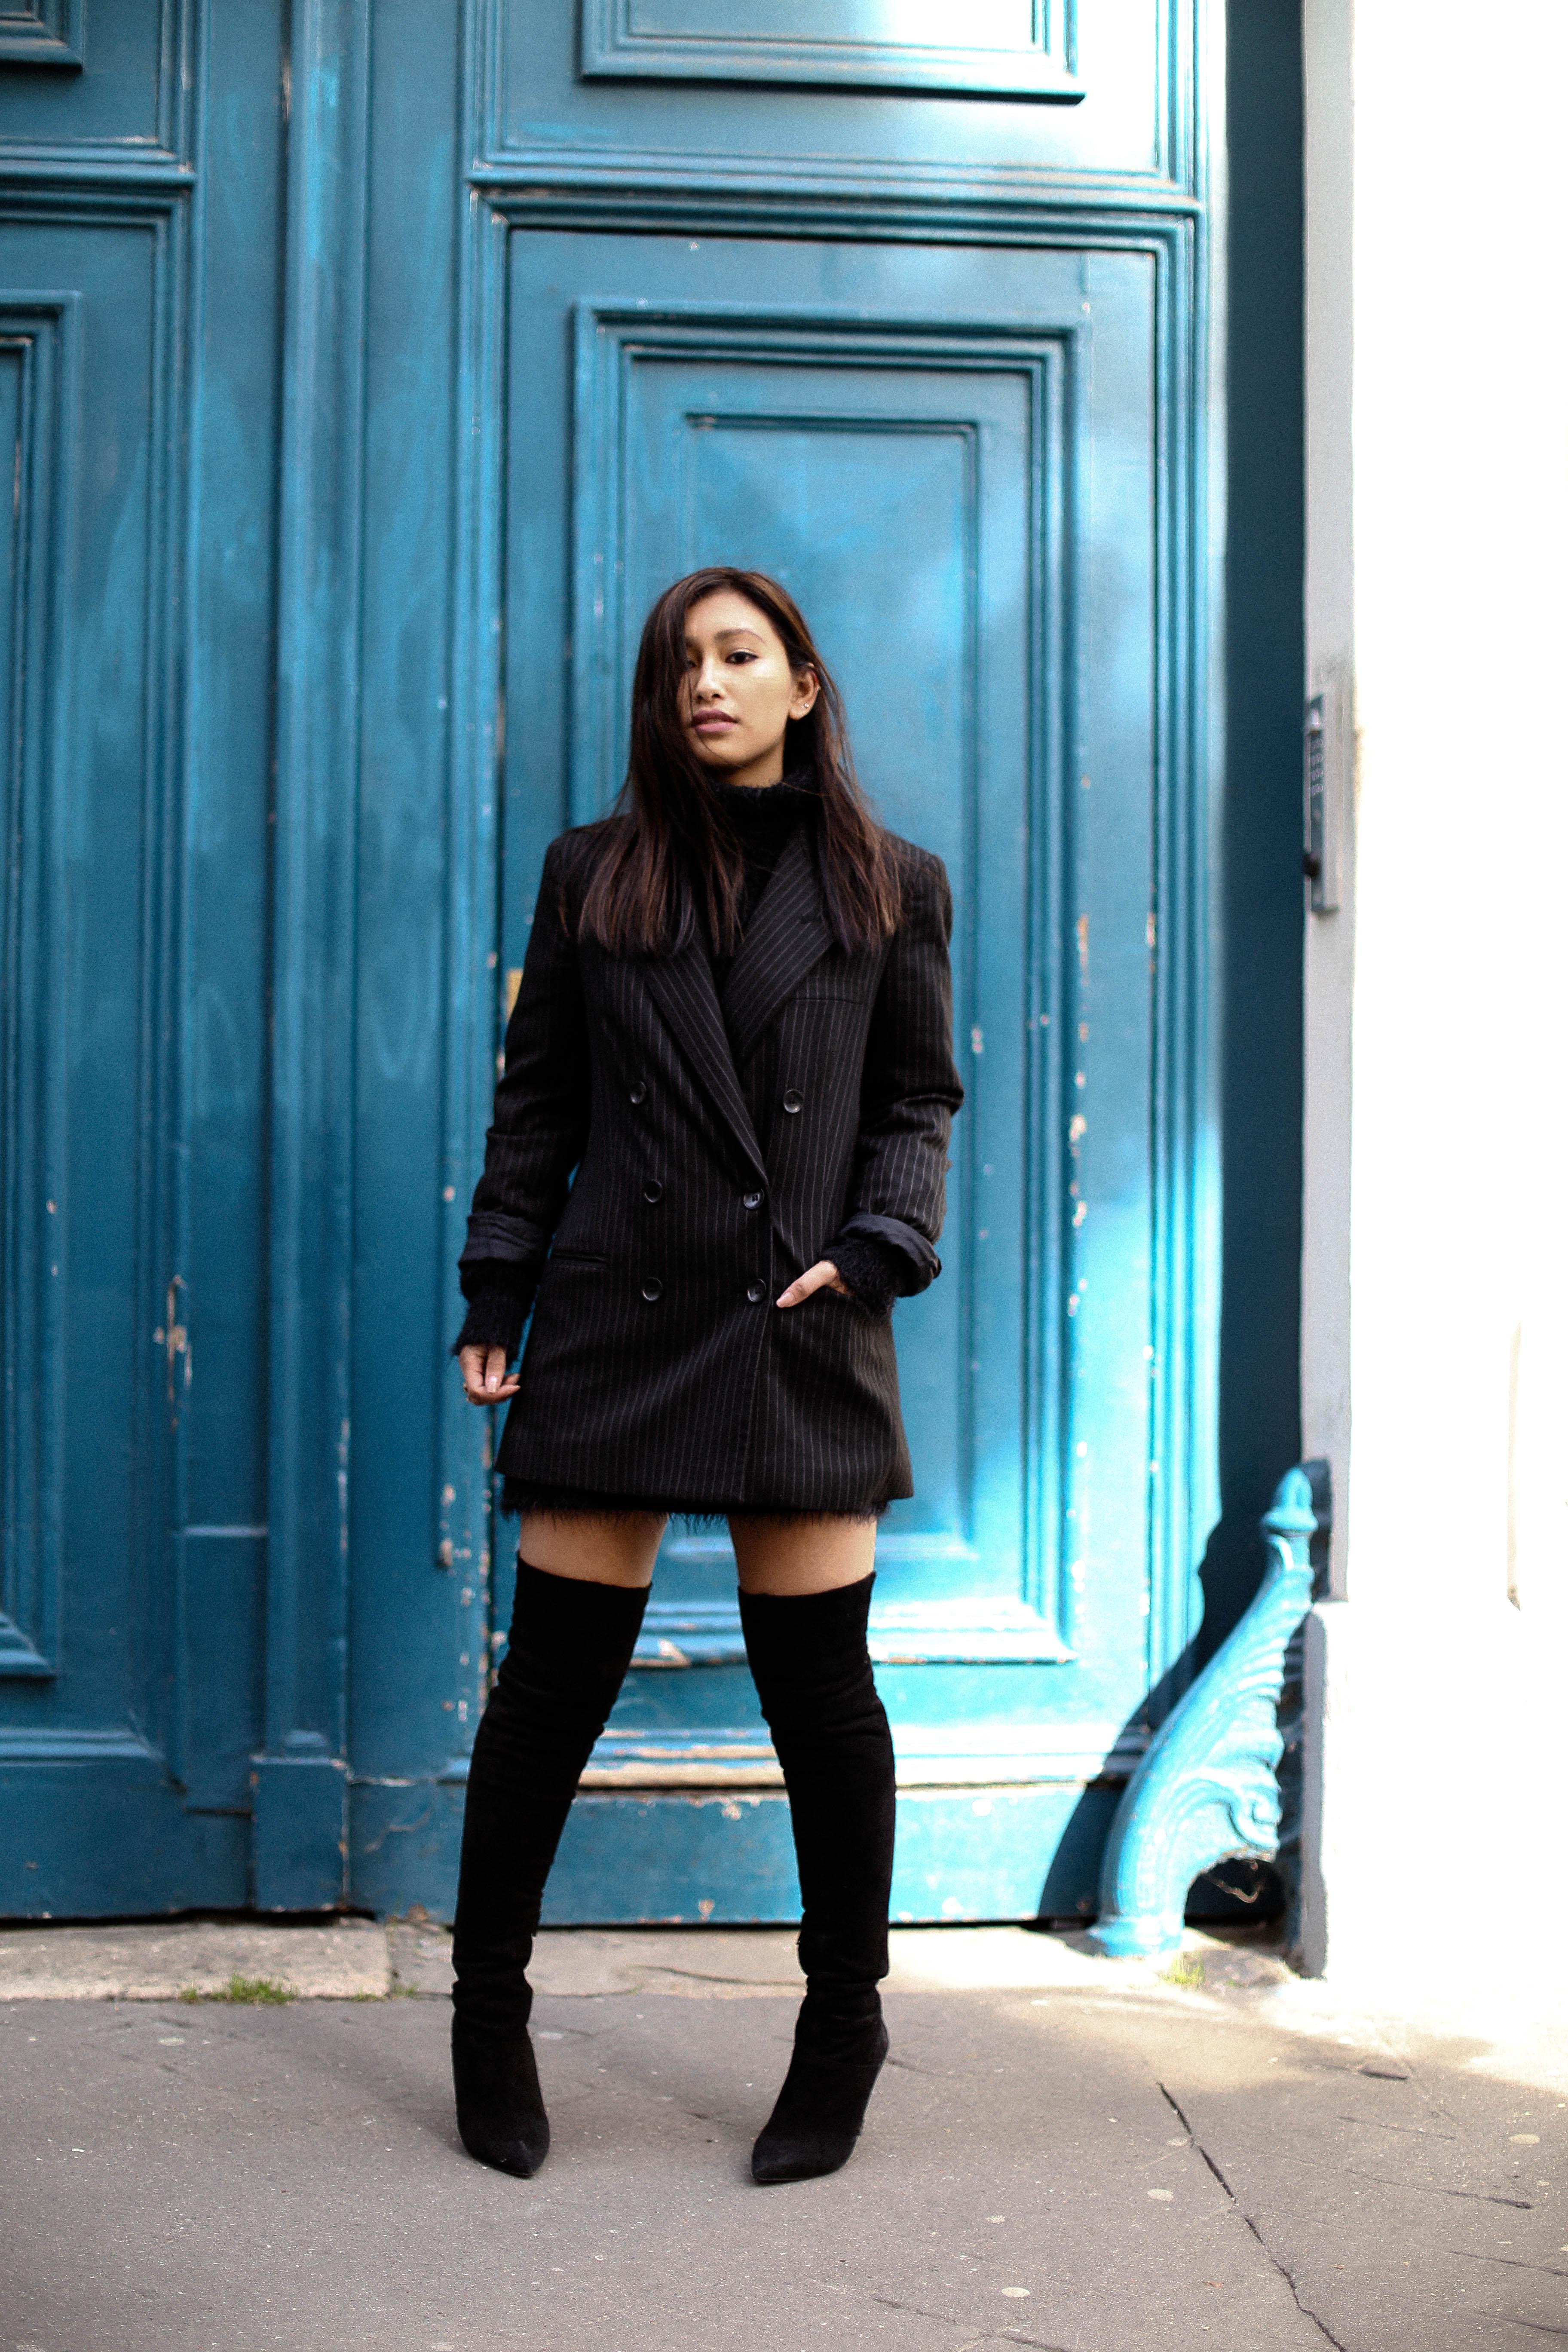 black tailor blog mode paris lifestyle tendances. Black Bedroom Furniture Sets. Home Design Ideas